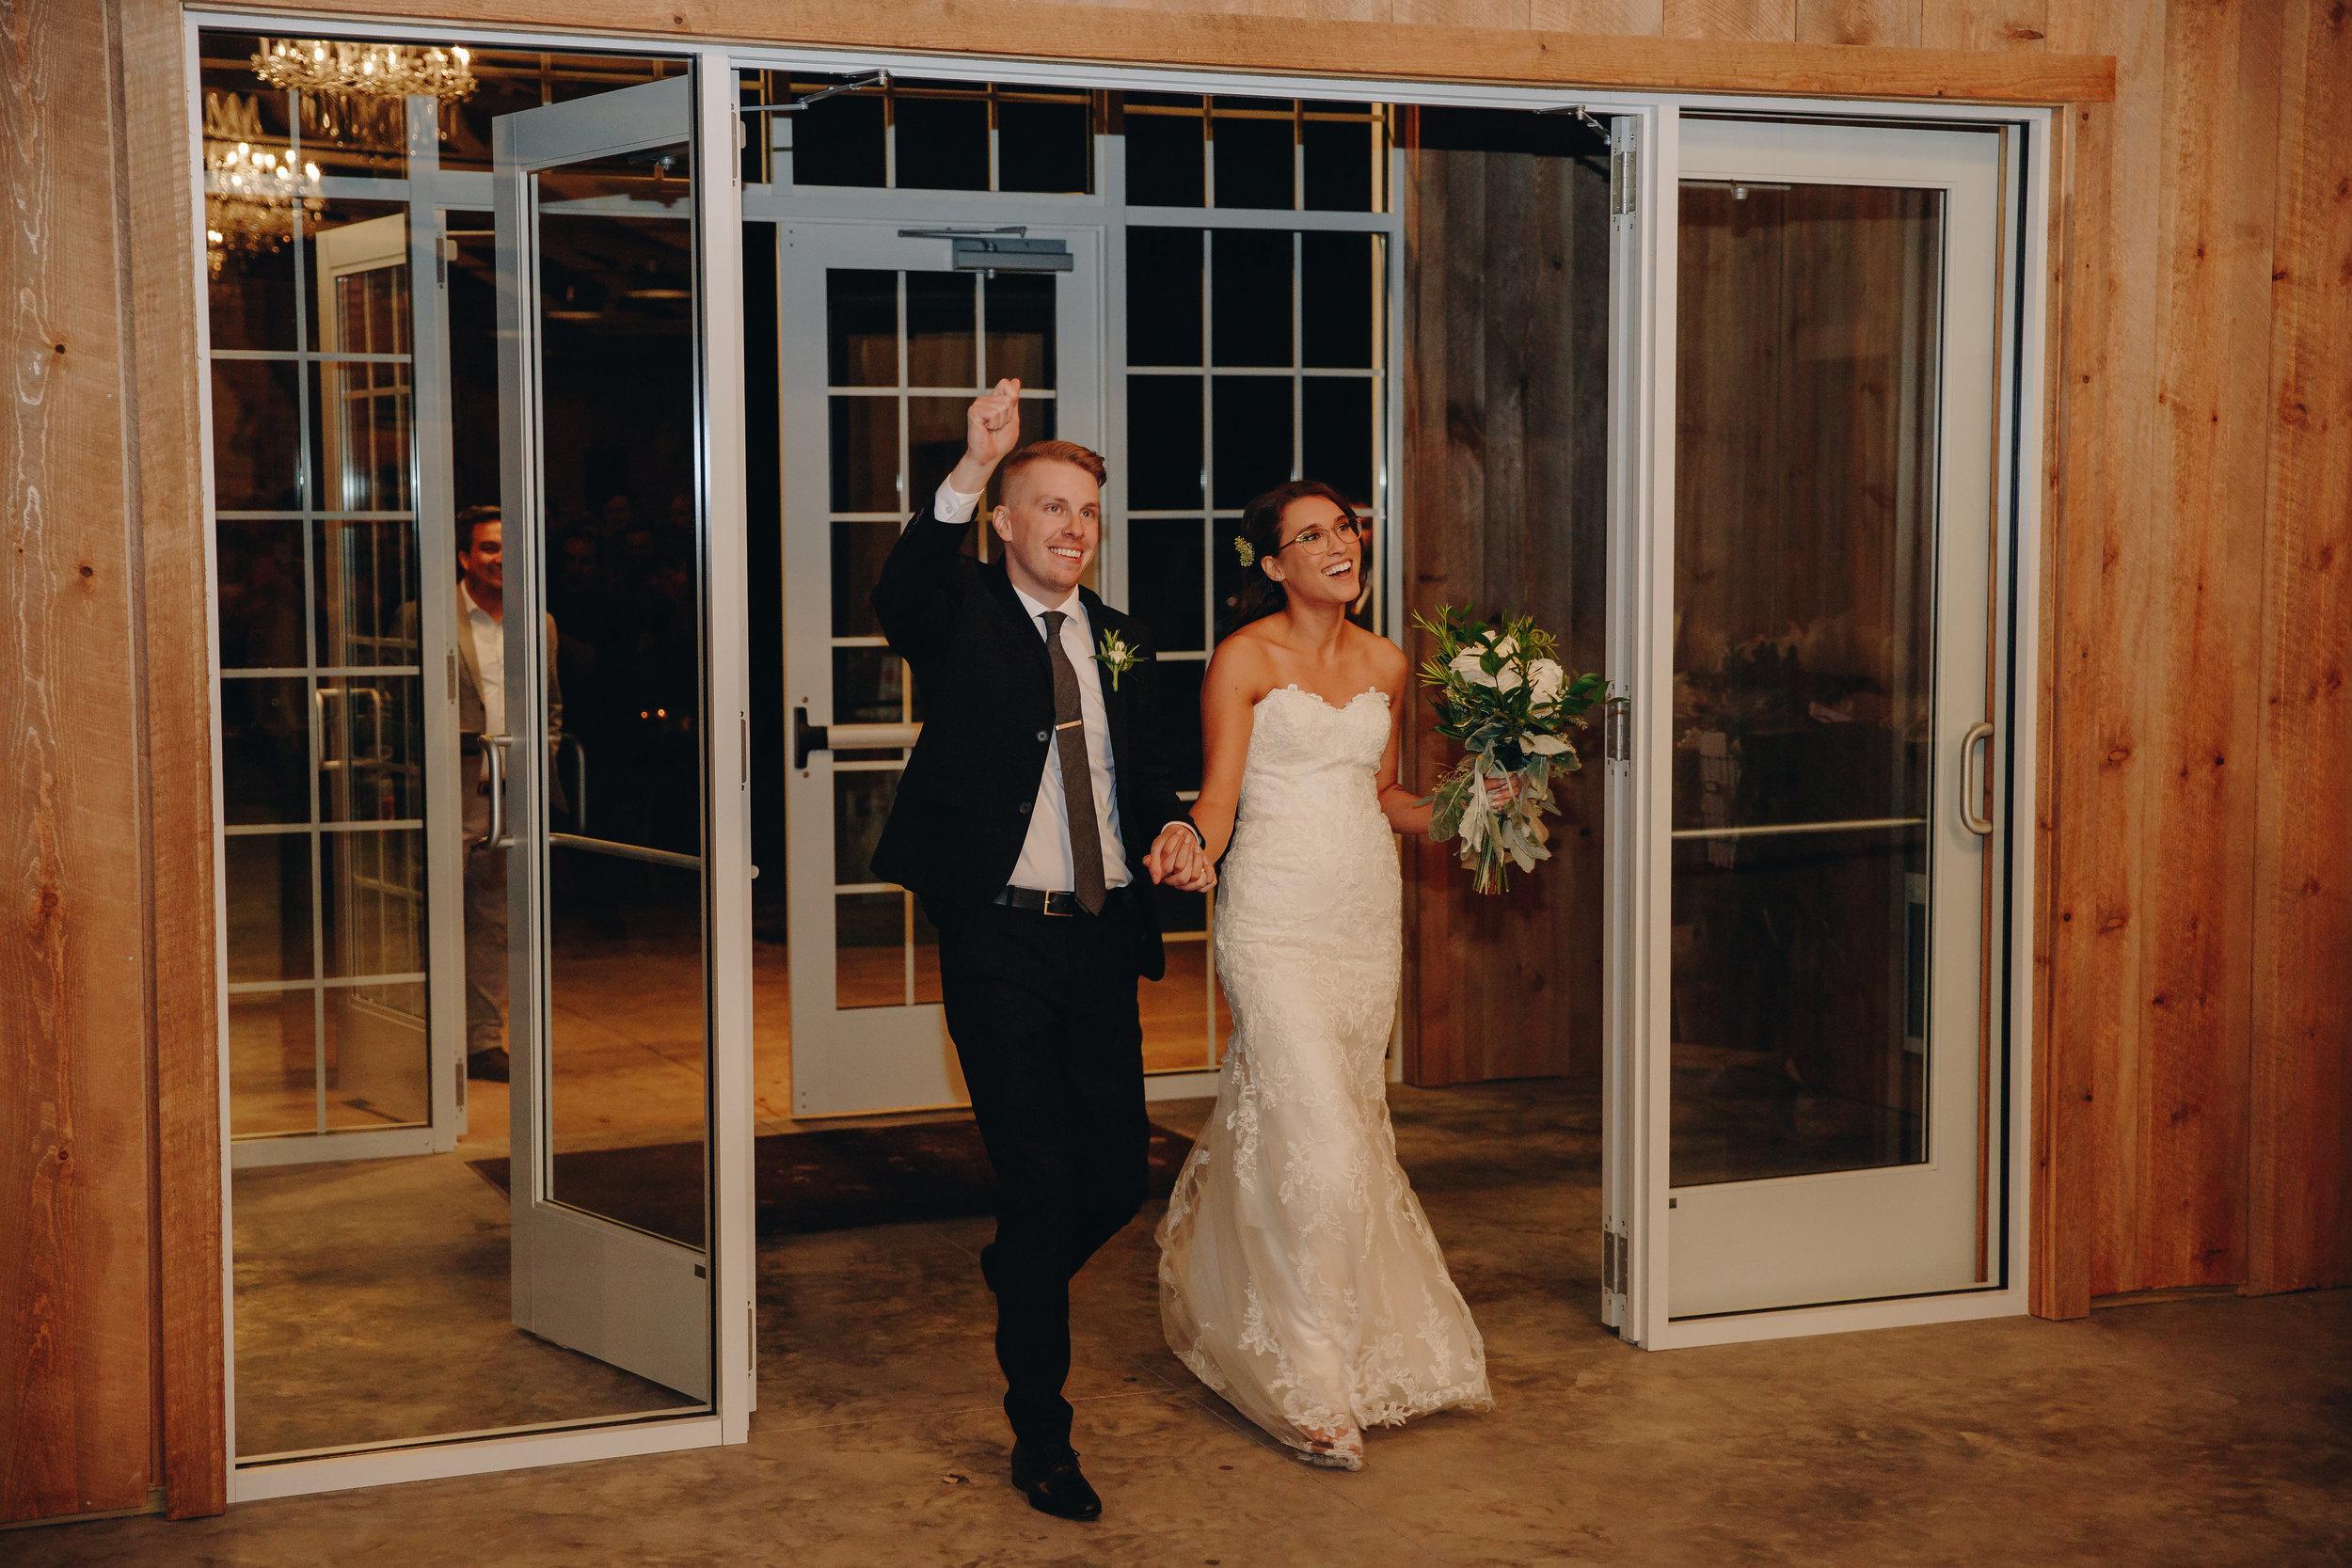 Bride and Groom entrance into modern barnhouse reception at their wedding